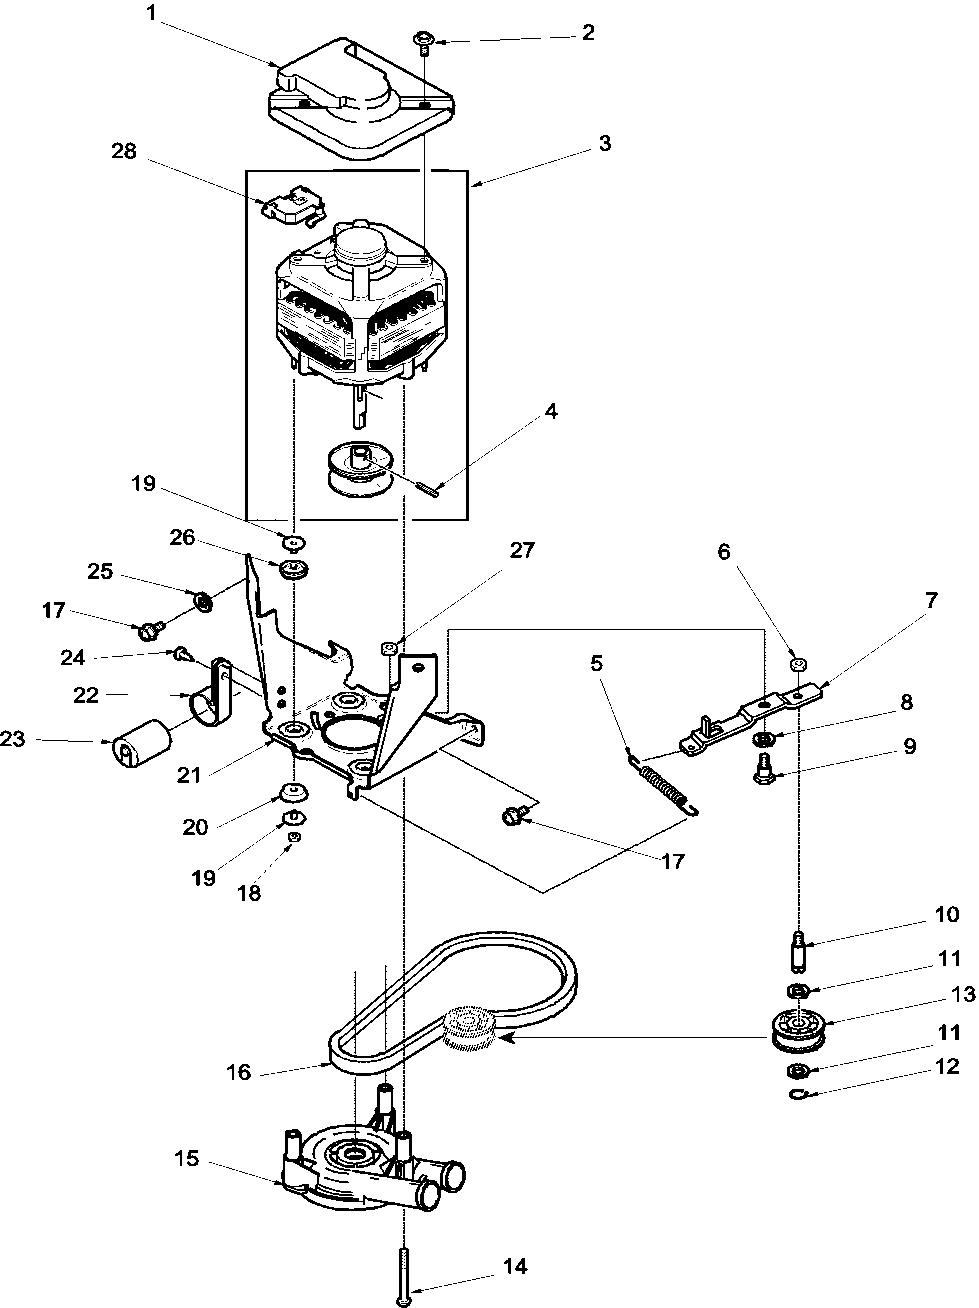 (28 parts)